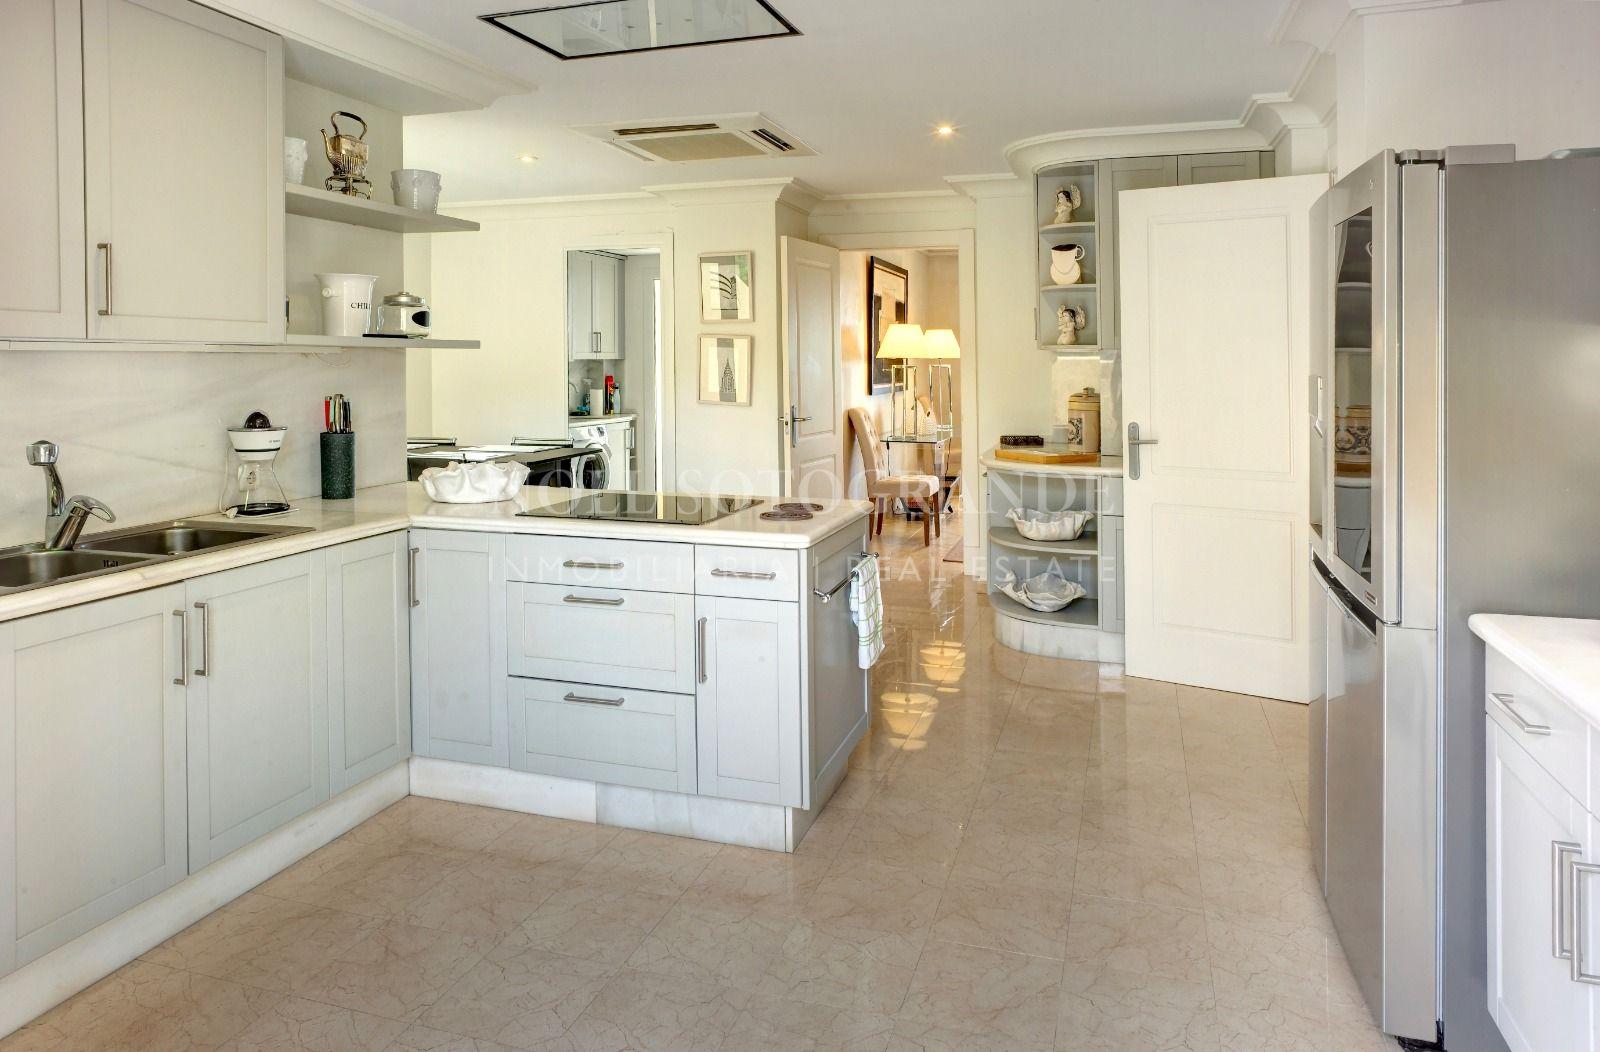 Penthouse for rent in Valgrande, Sotogrande